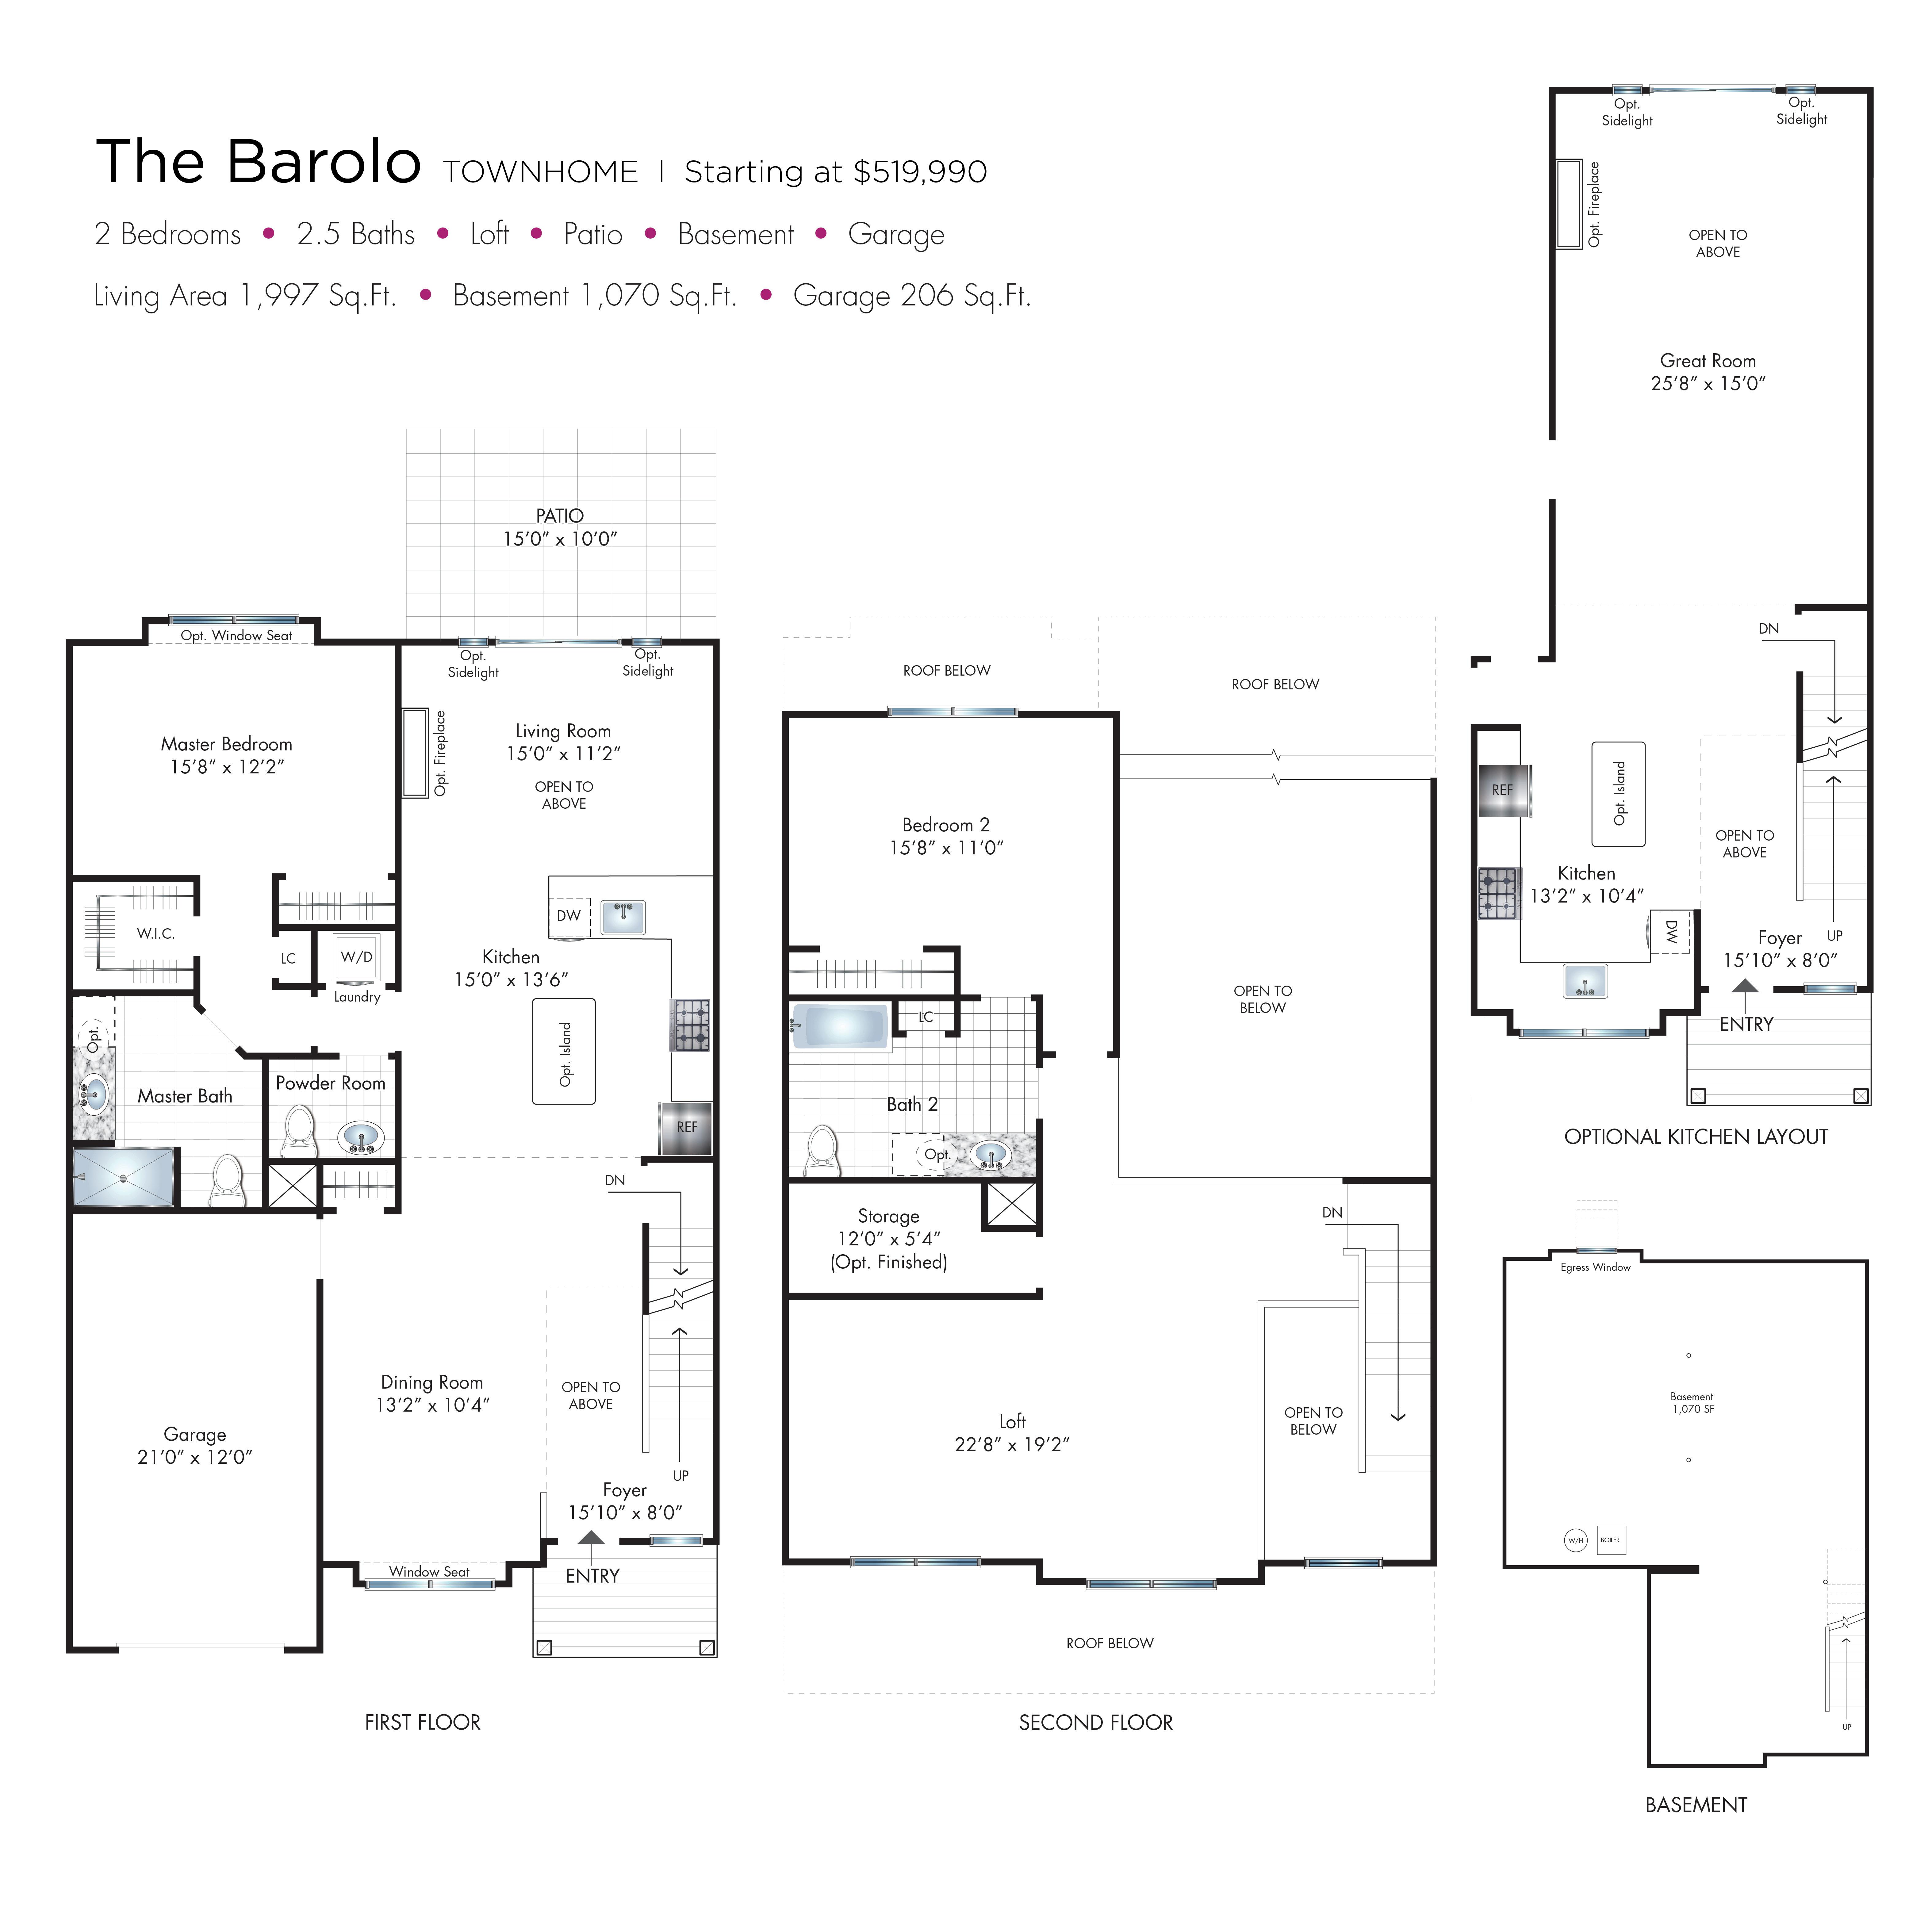 Barolo Townhome Floor Plan